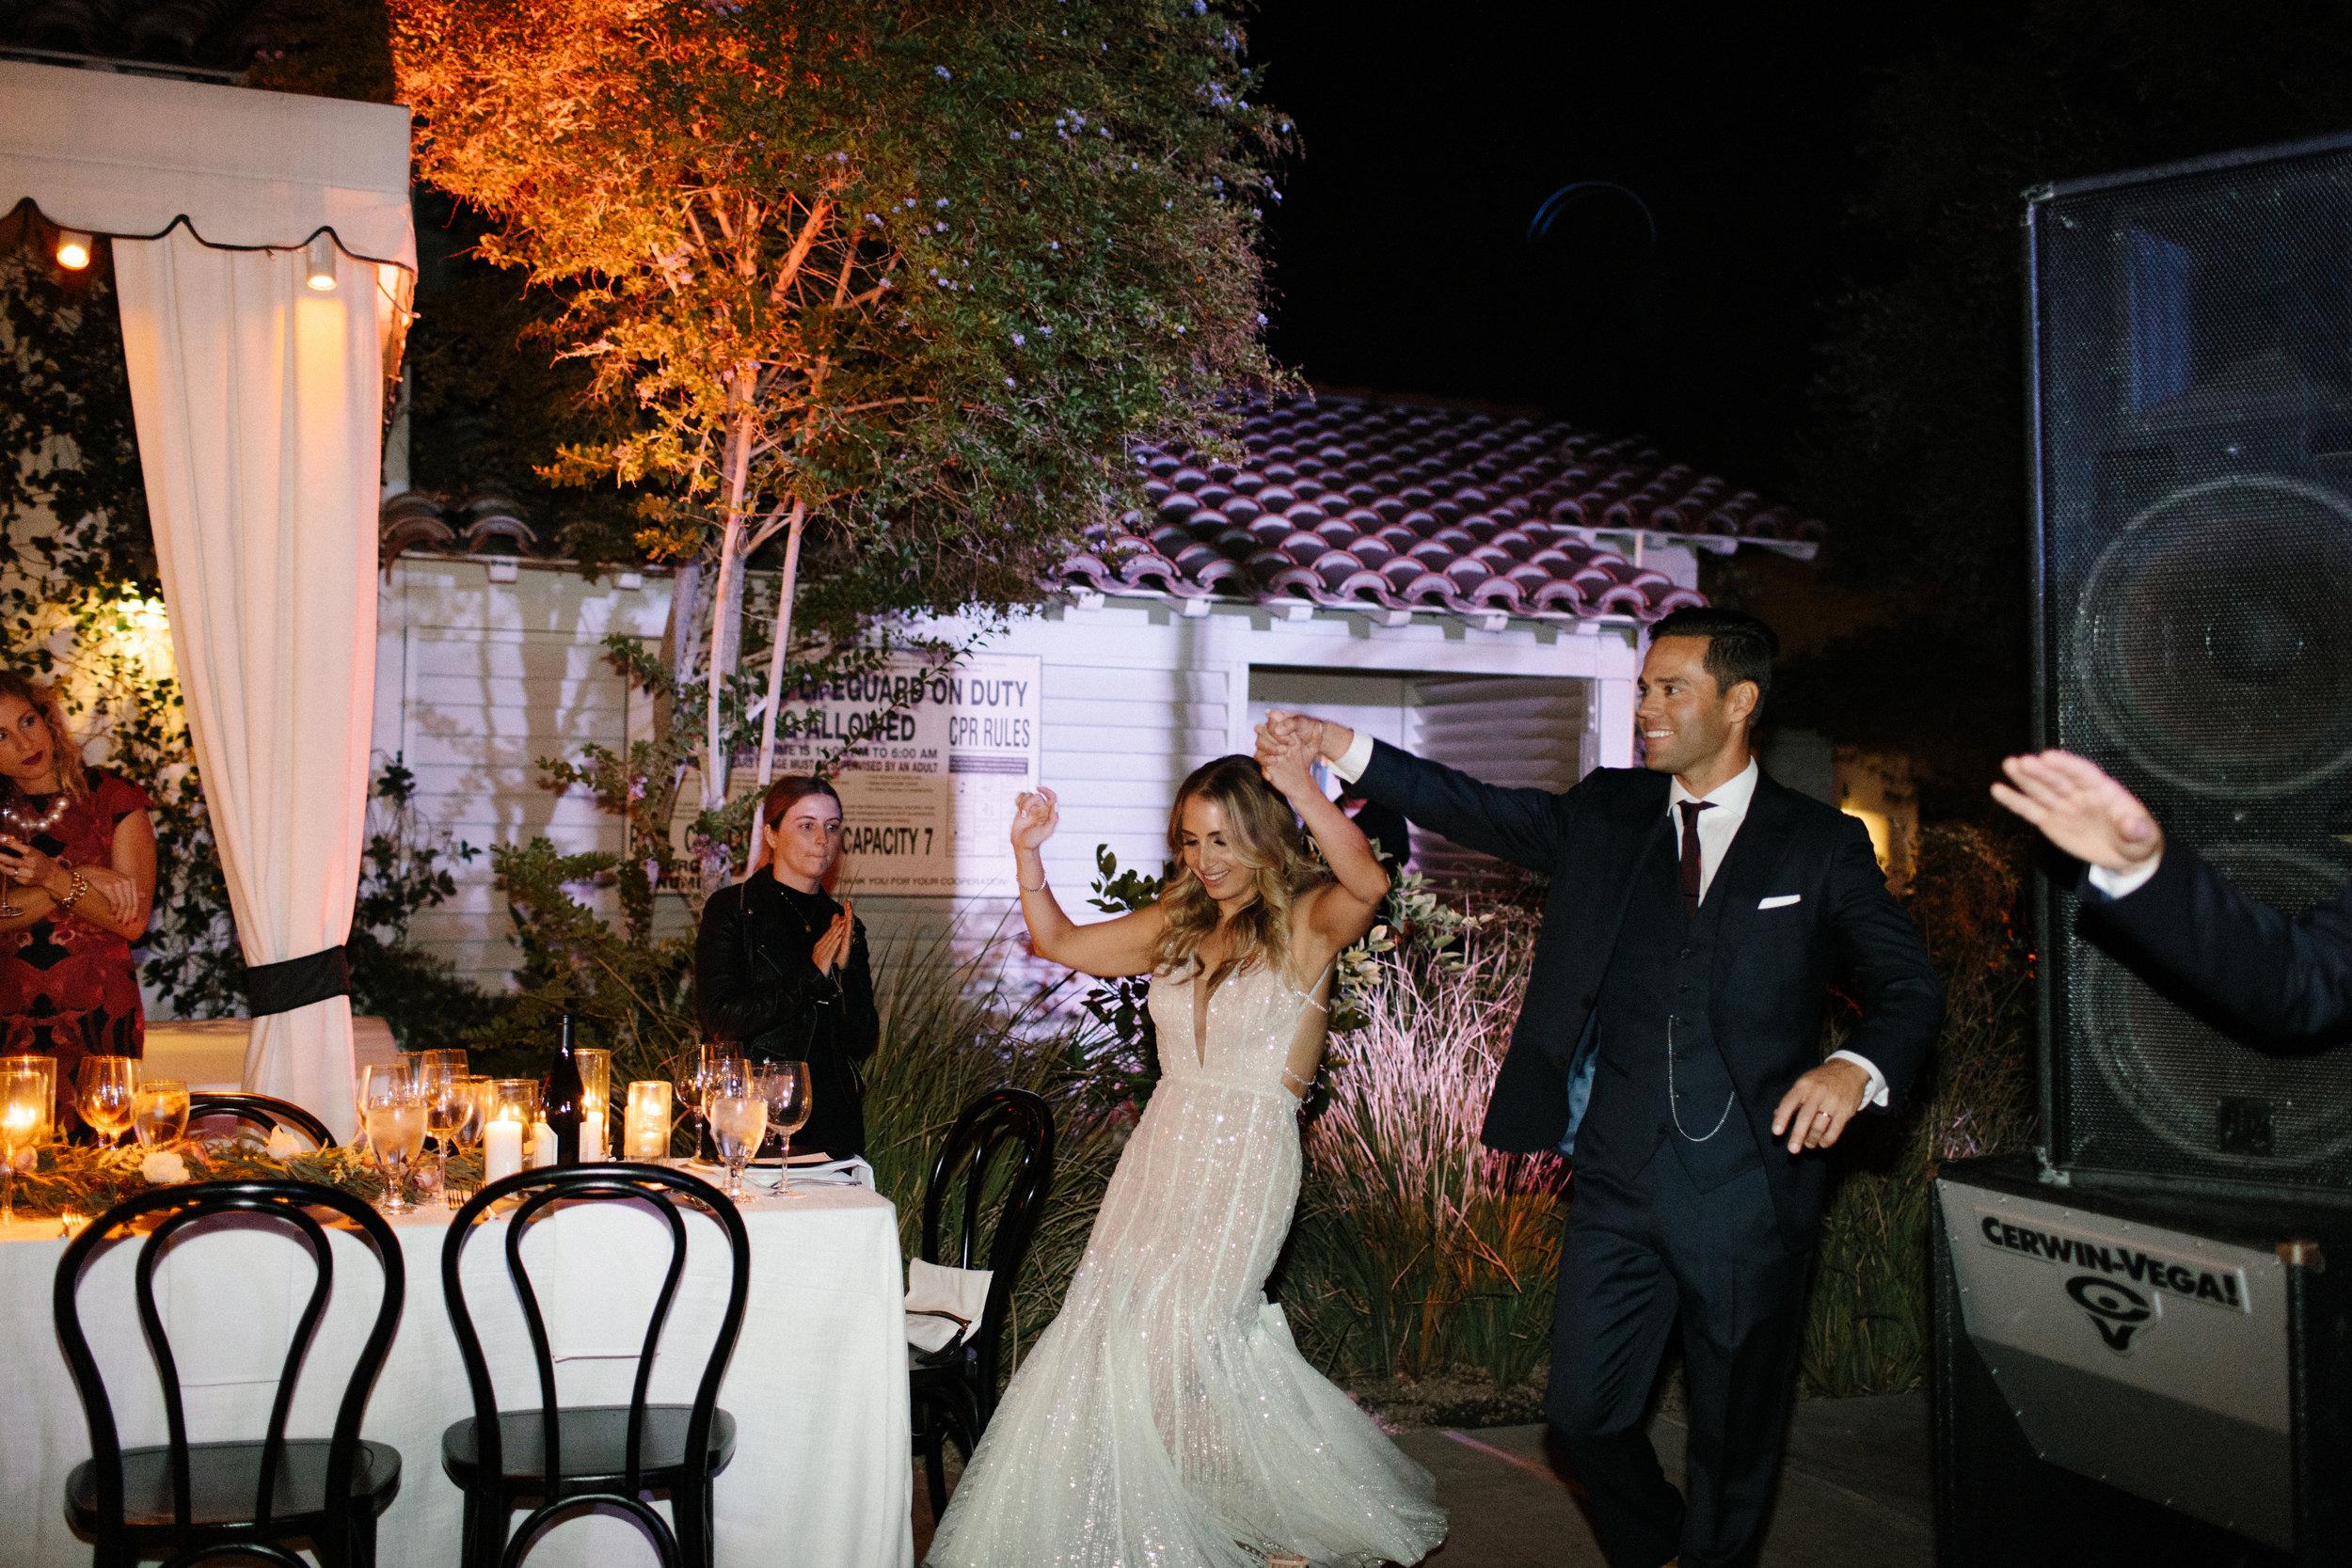 Dara_&_Garrett_Colony_Palms_Hotel_Wedding_Photos-497.jpg